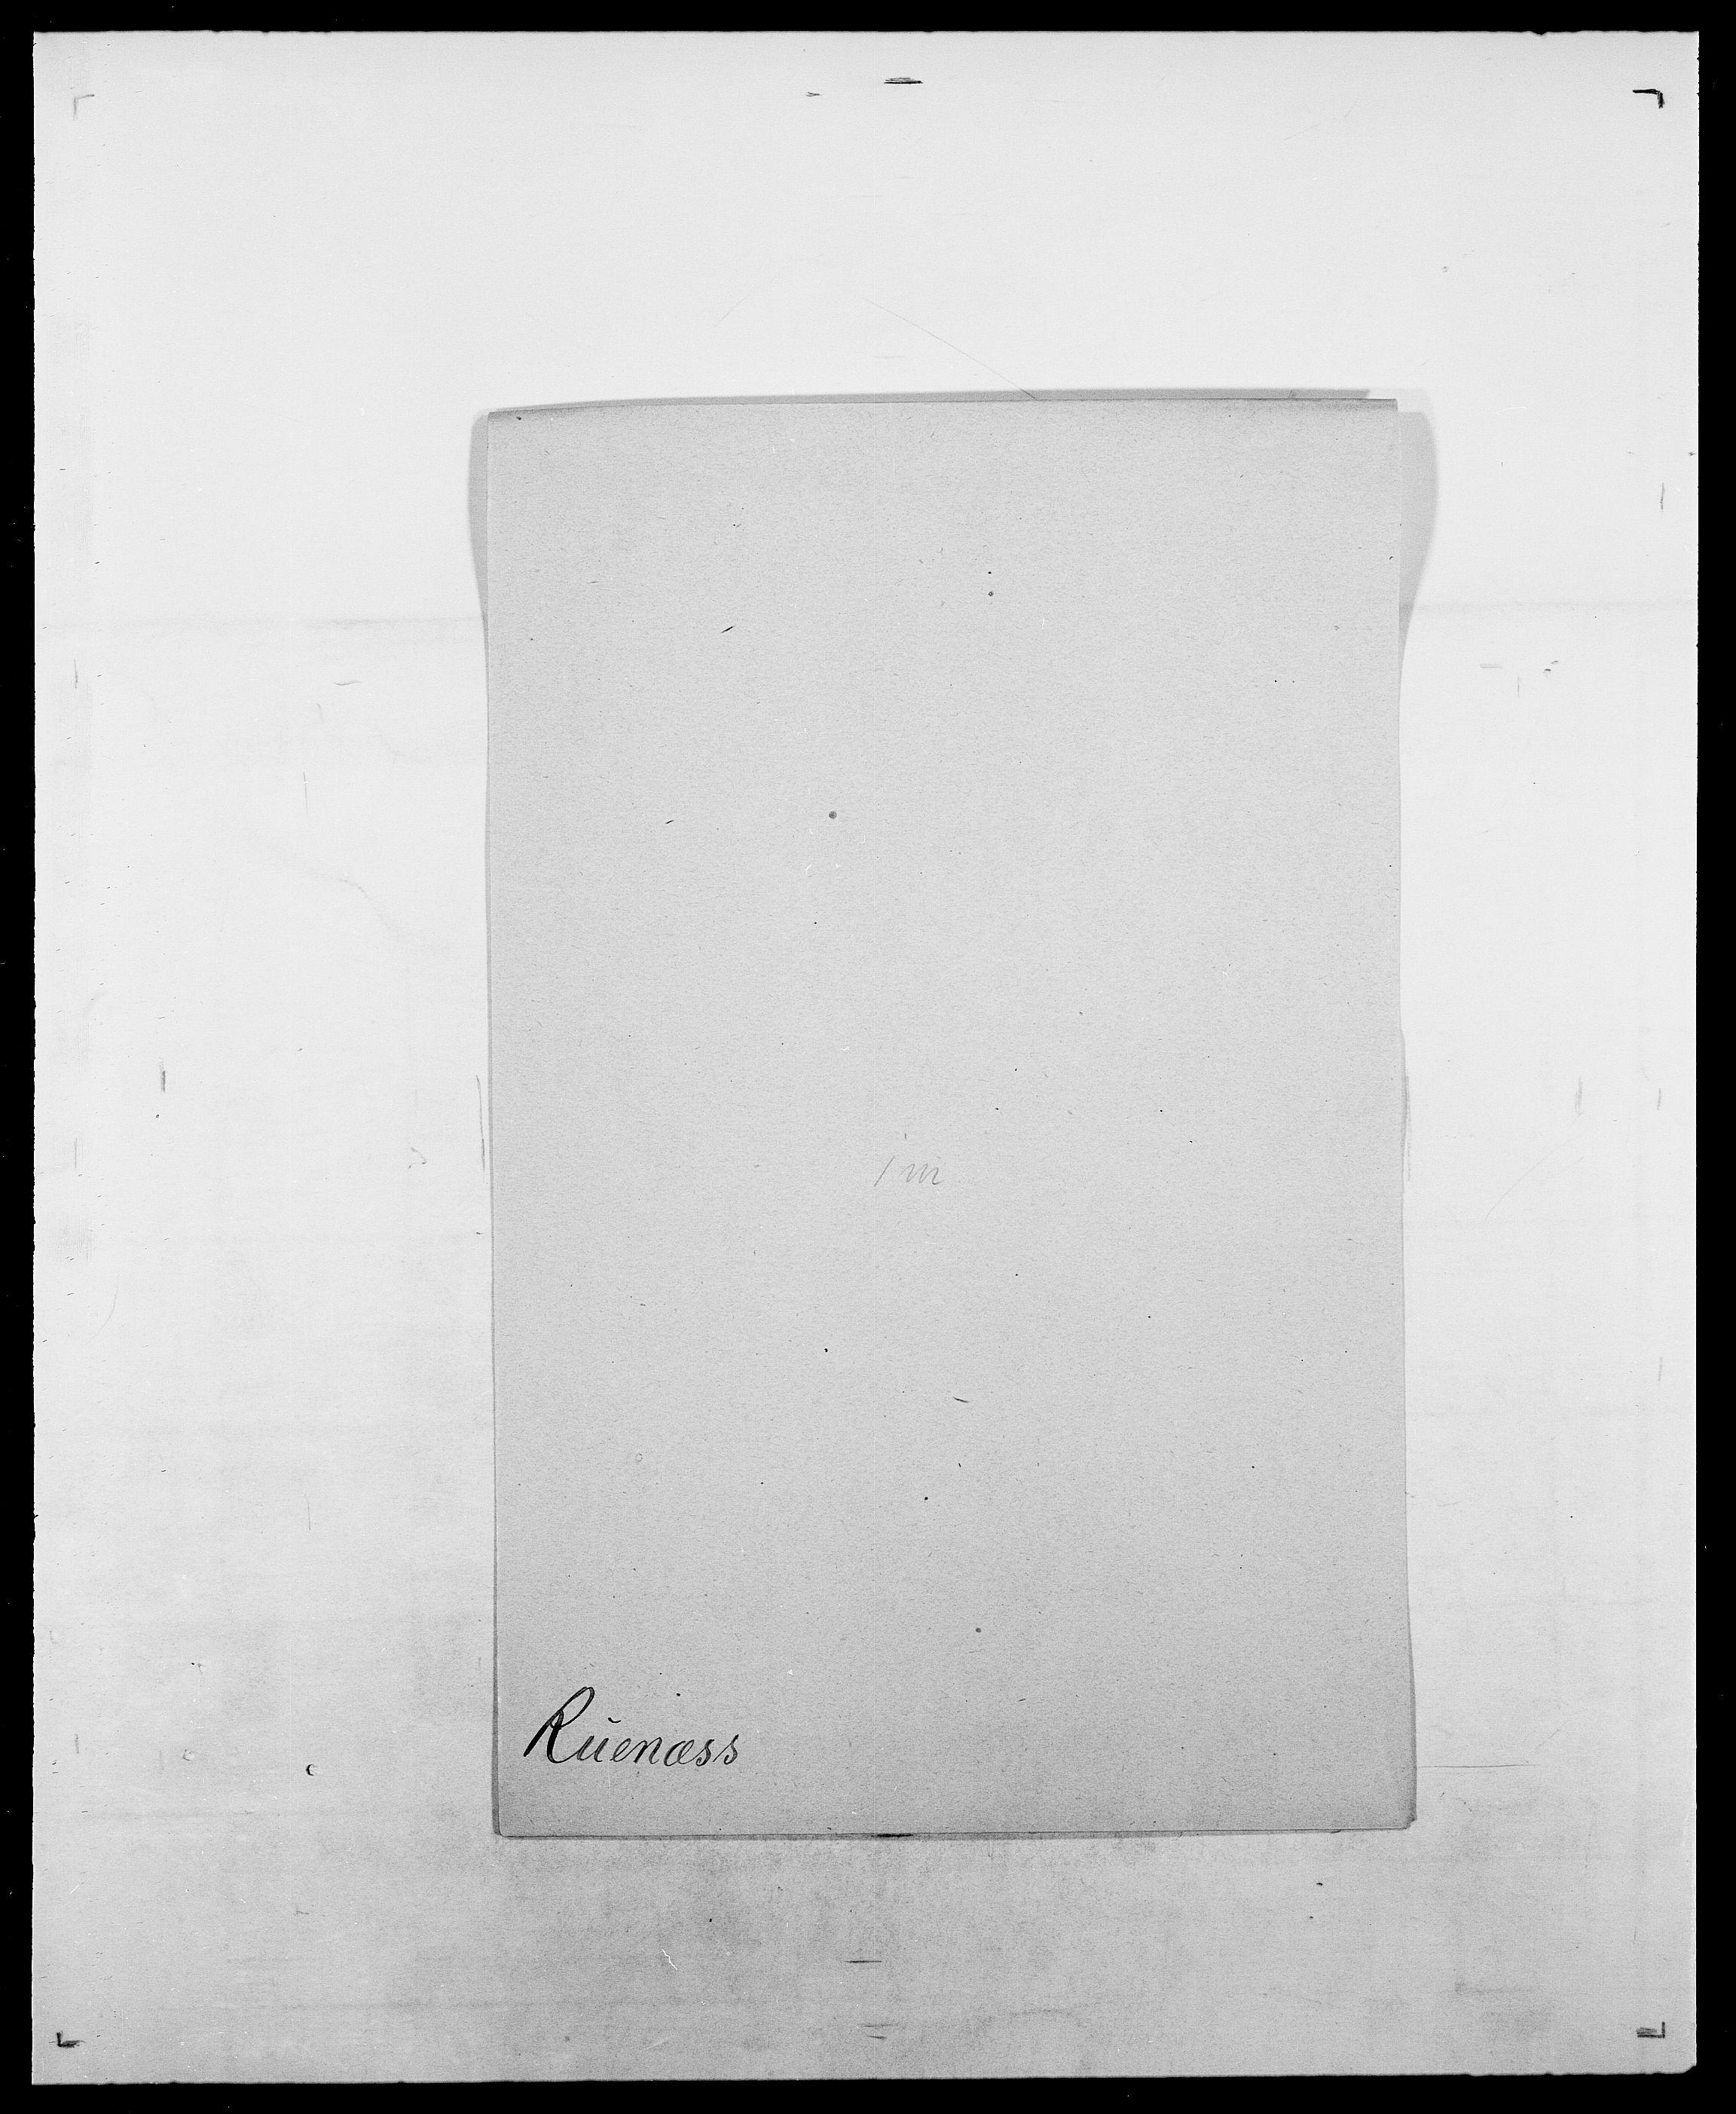 SAO, Delgobe, Charles Antoine - samling, D/Da/L0033: Roald - Røyem, s. 443